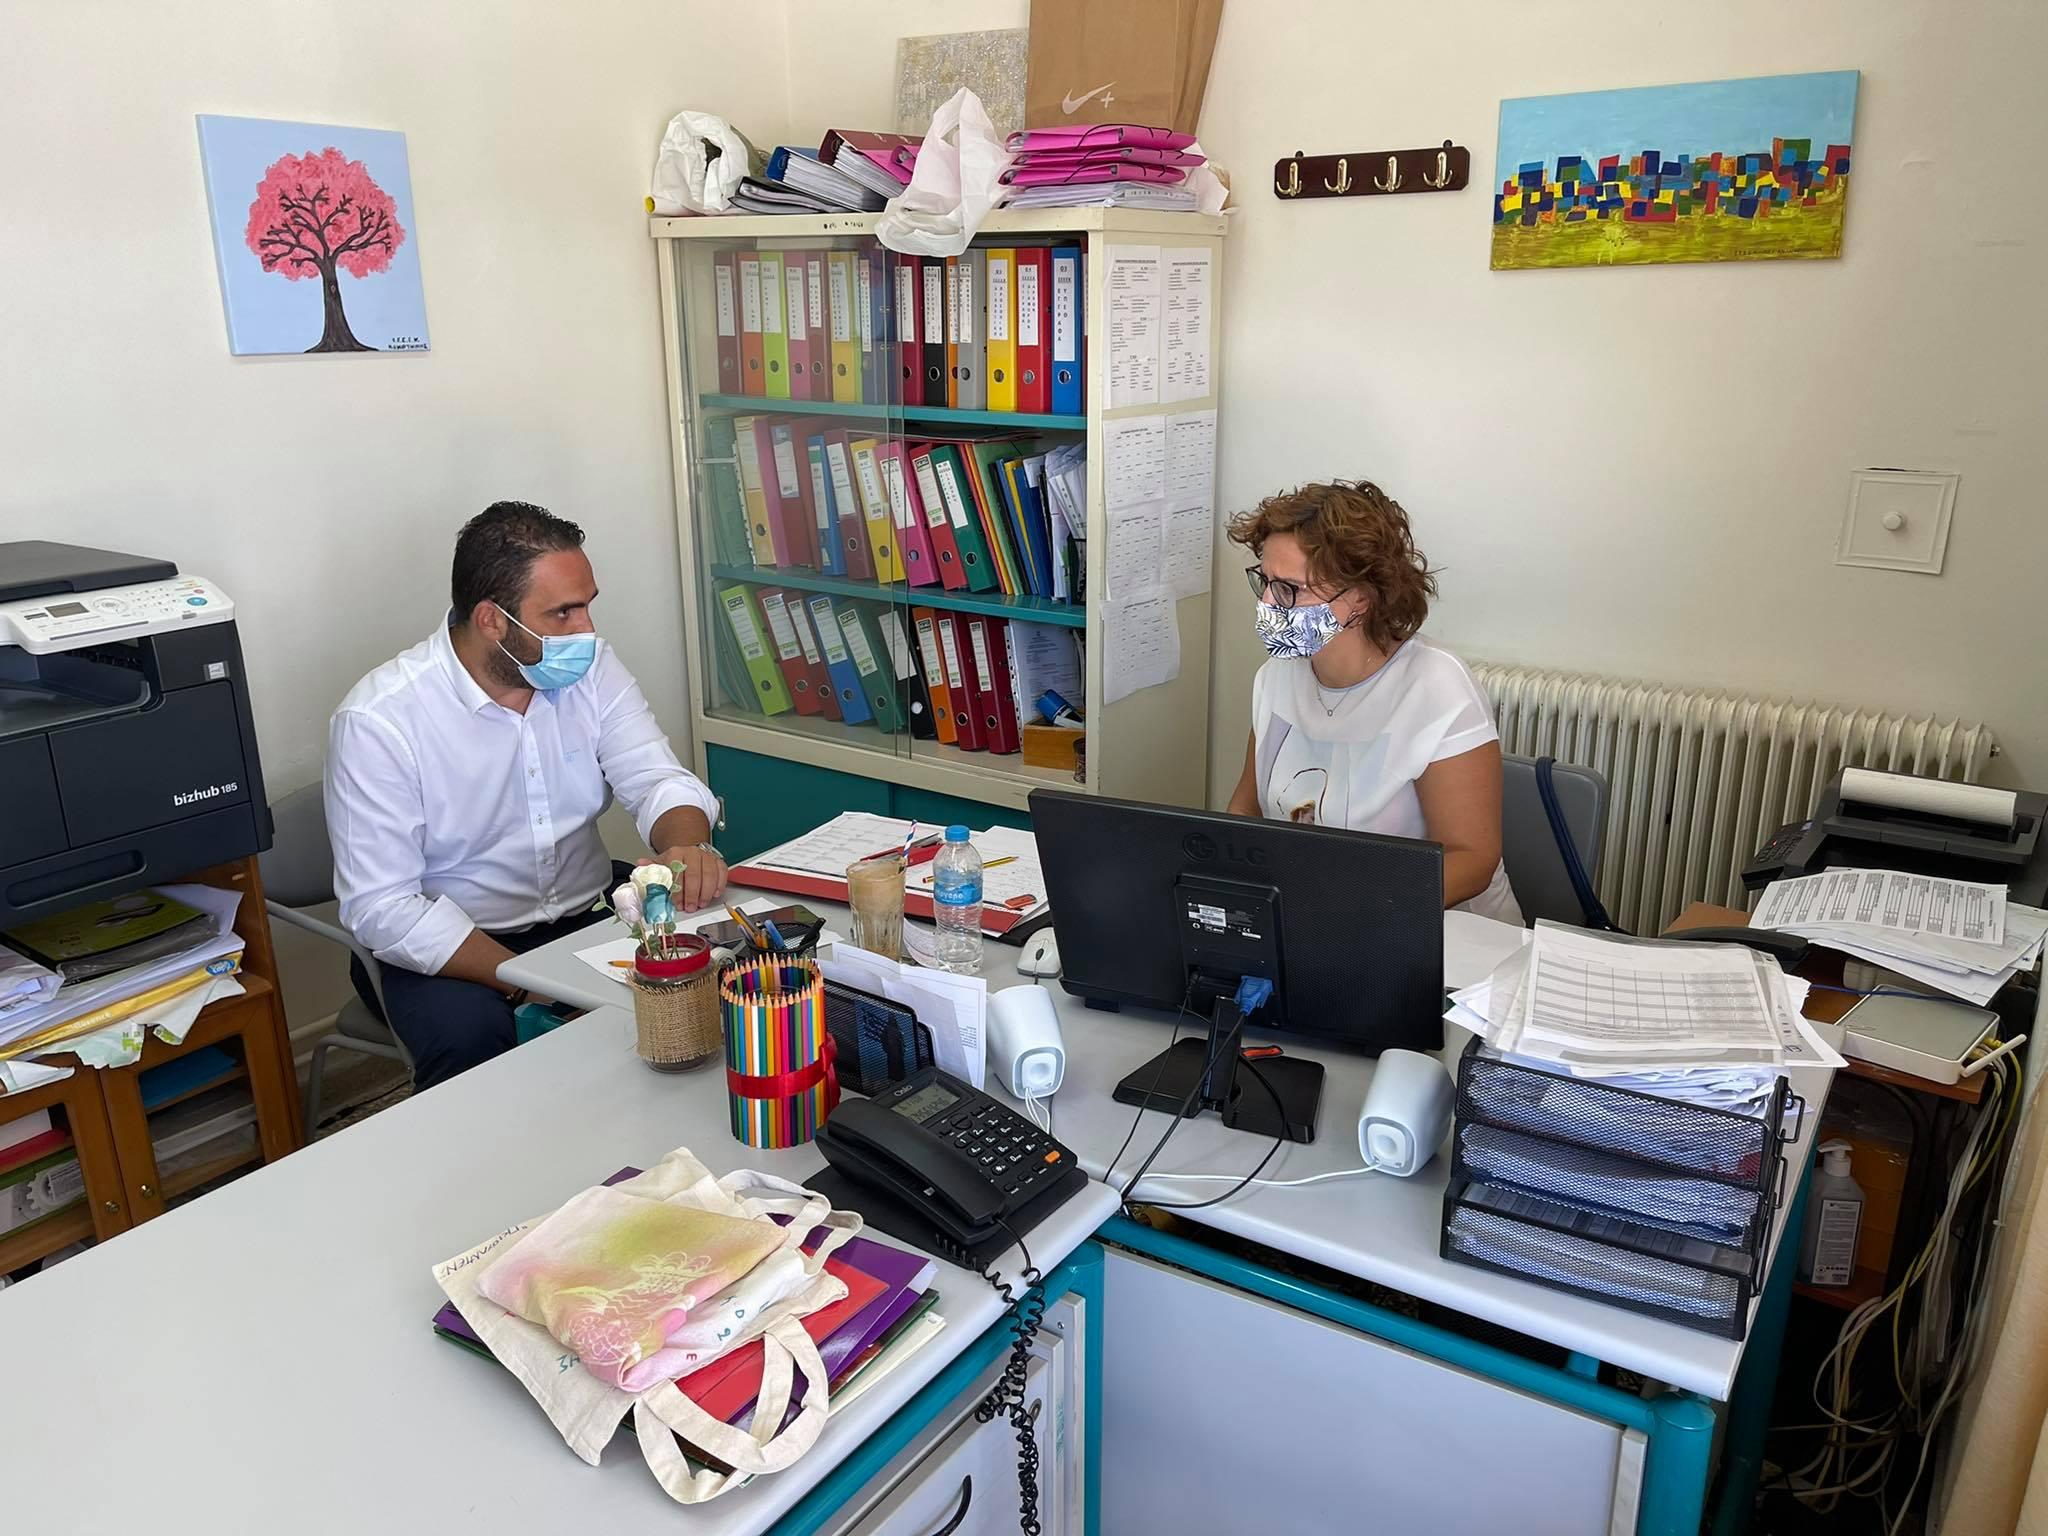 Aντώνης Γραβάνης : «Ντροπή αποτελούν  για Δήμαρχο και Δημοτική Αρχή οι εικόνες από σχολεία του Δήμου μας»